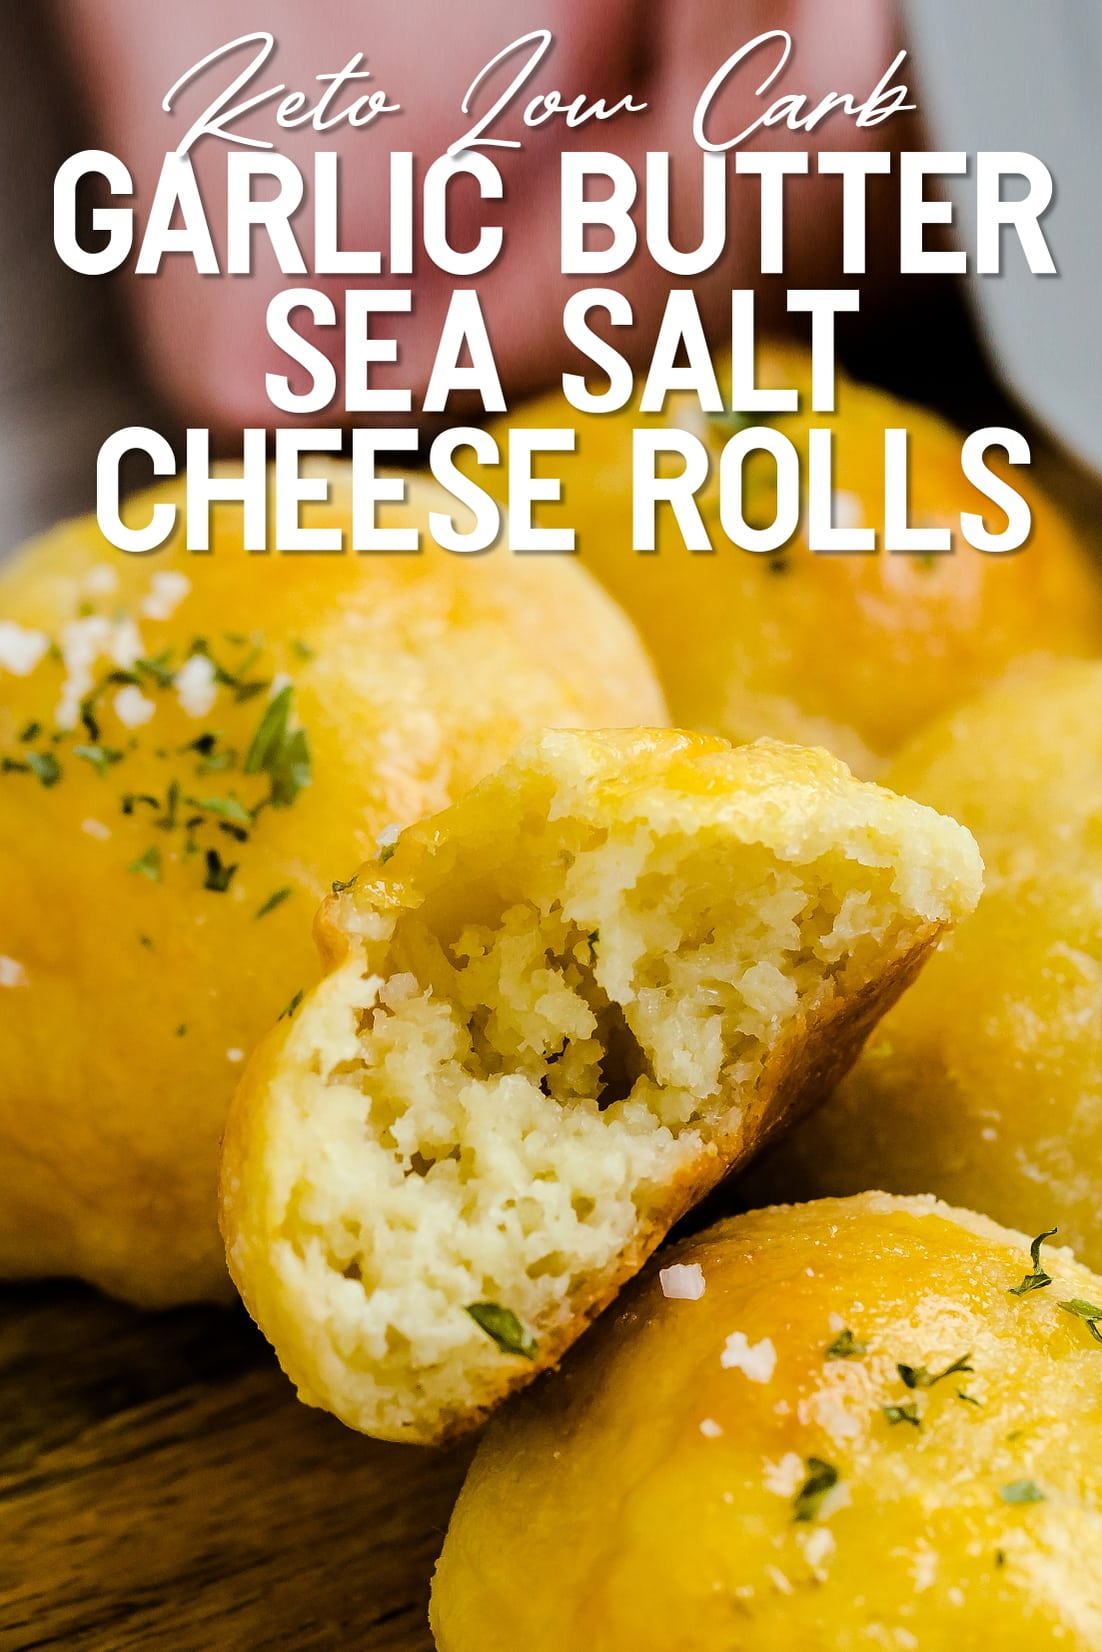 Garlic Butter Sea Salt Cheese Rolls torn into two